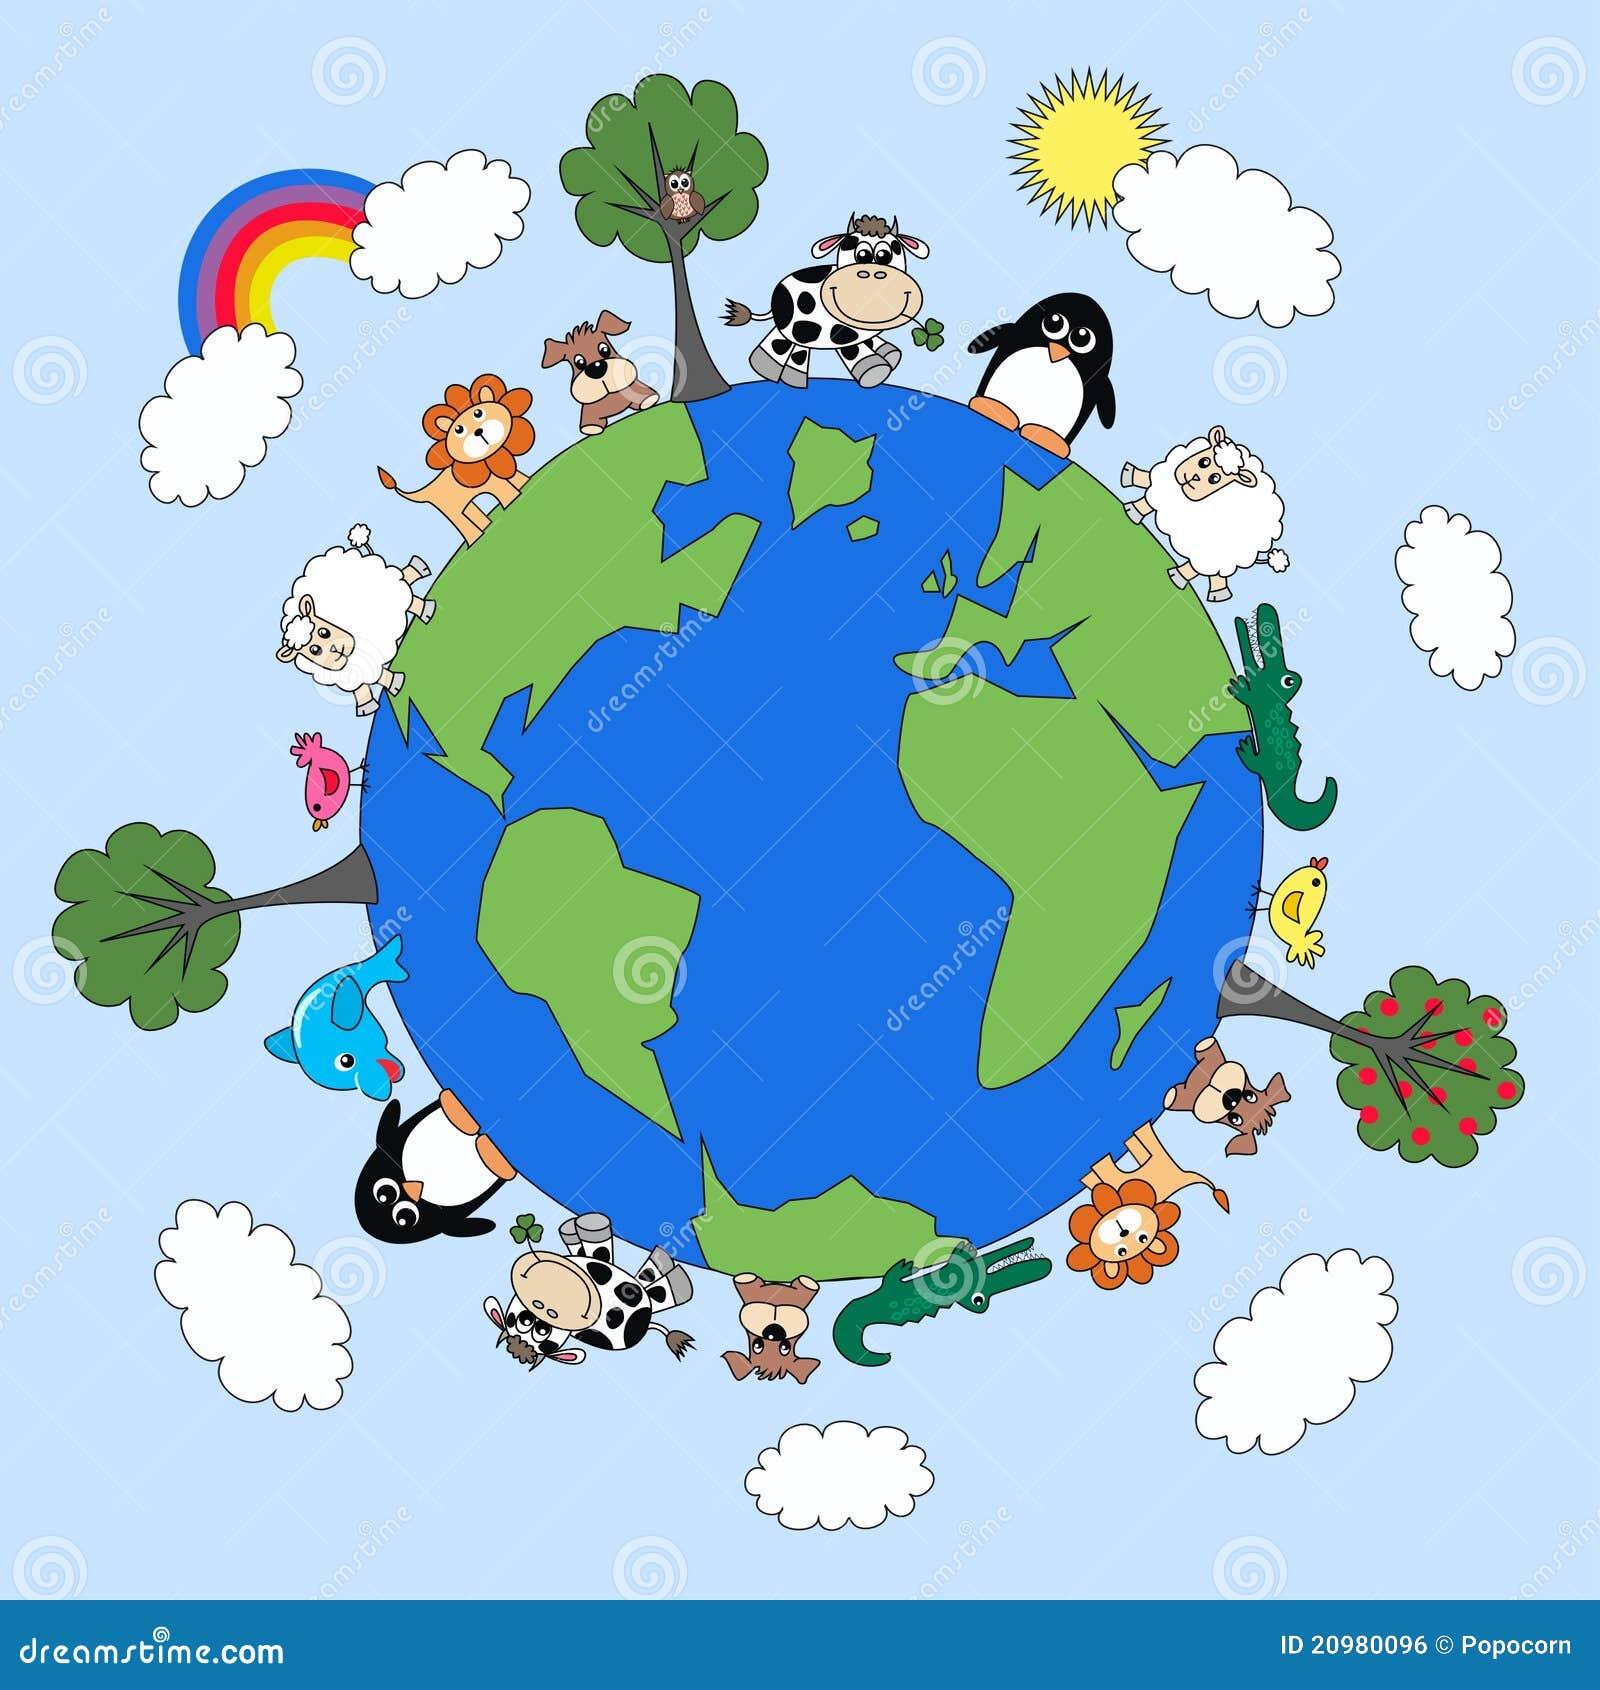 animal planet royalty free stock image image 20980096 zoo animal clip art images zoo animal clipart black and white